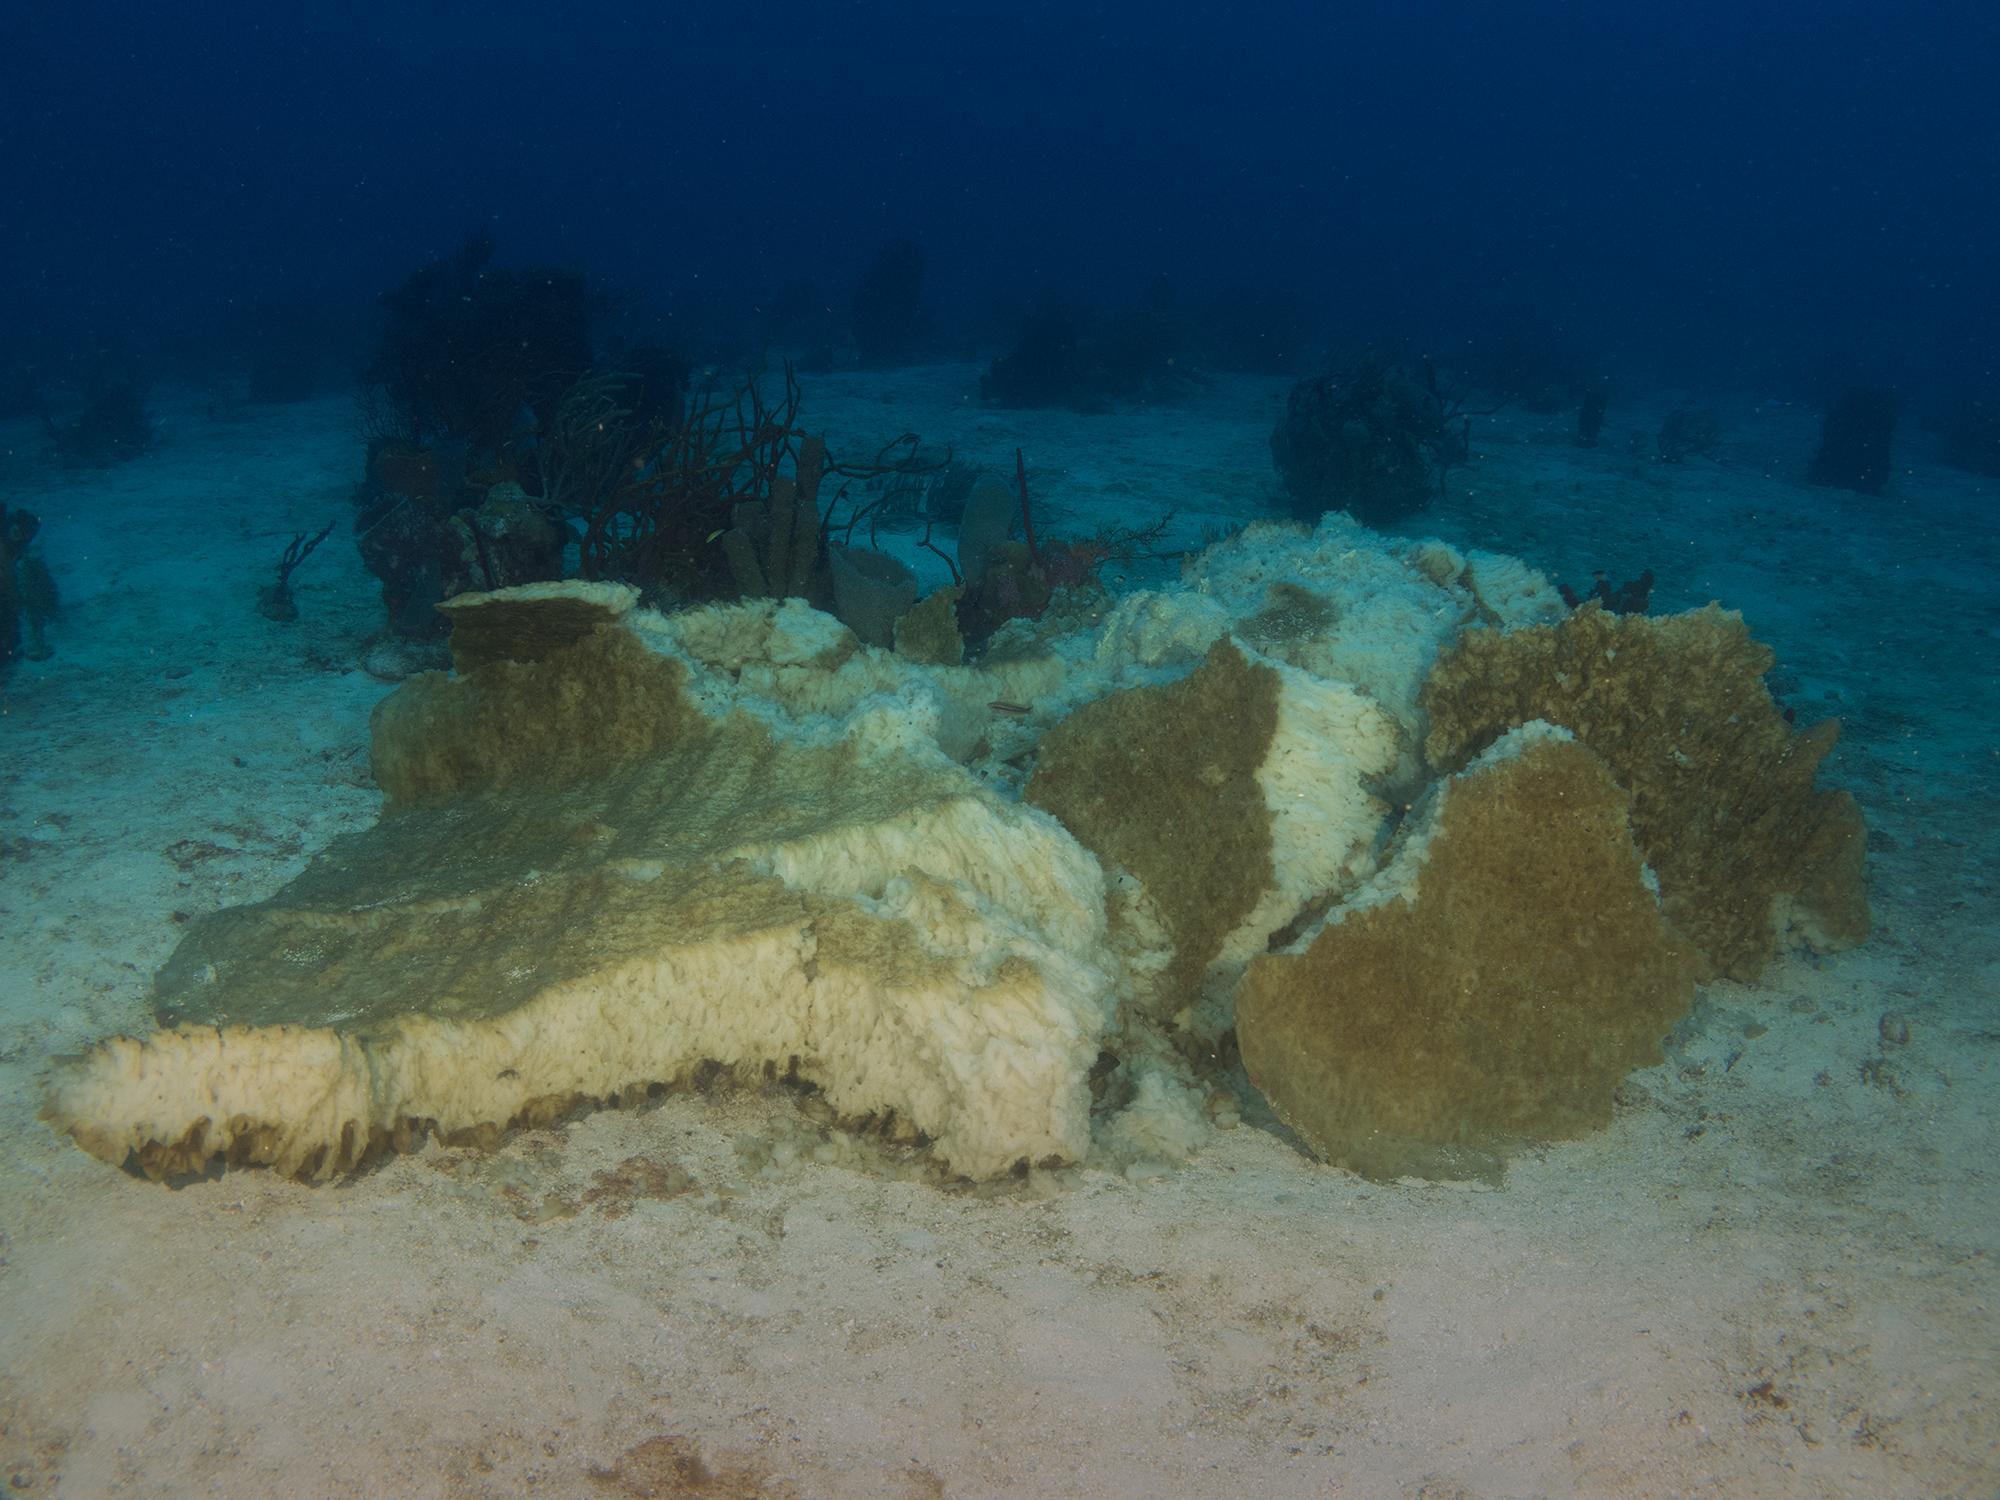 The end of The Big Sponge. Image -  Mickey Charteris